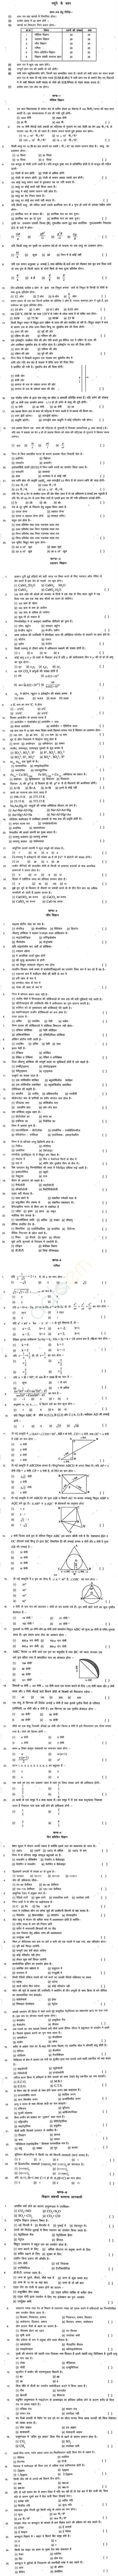 STSE 2014 Sample Paper